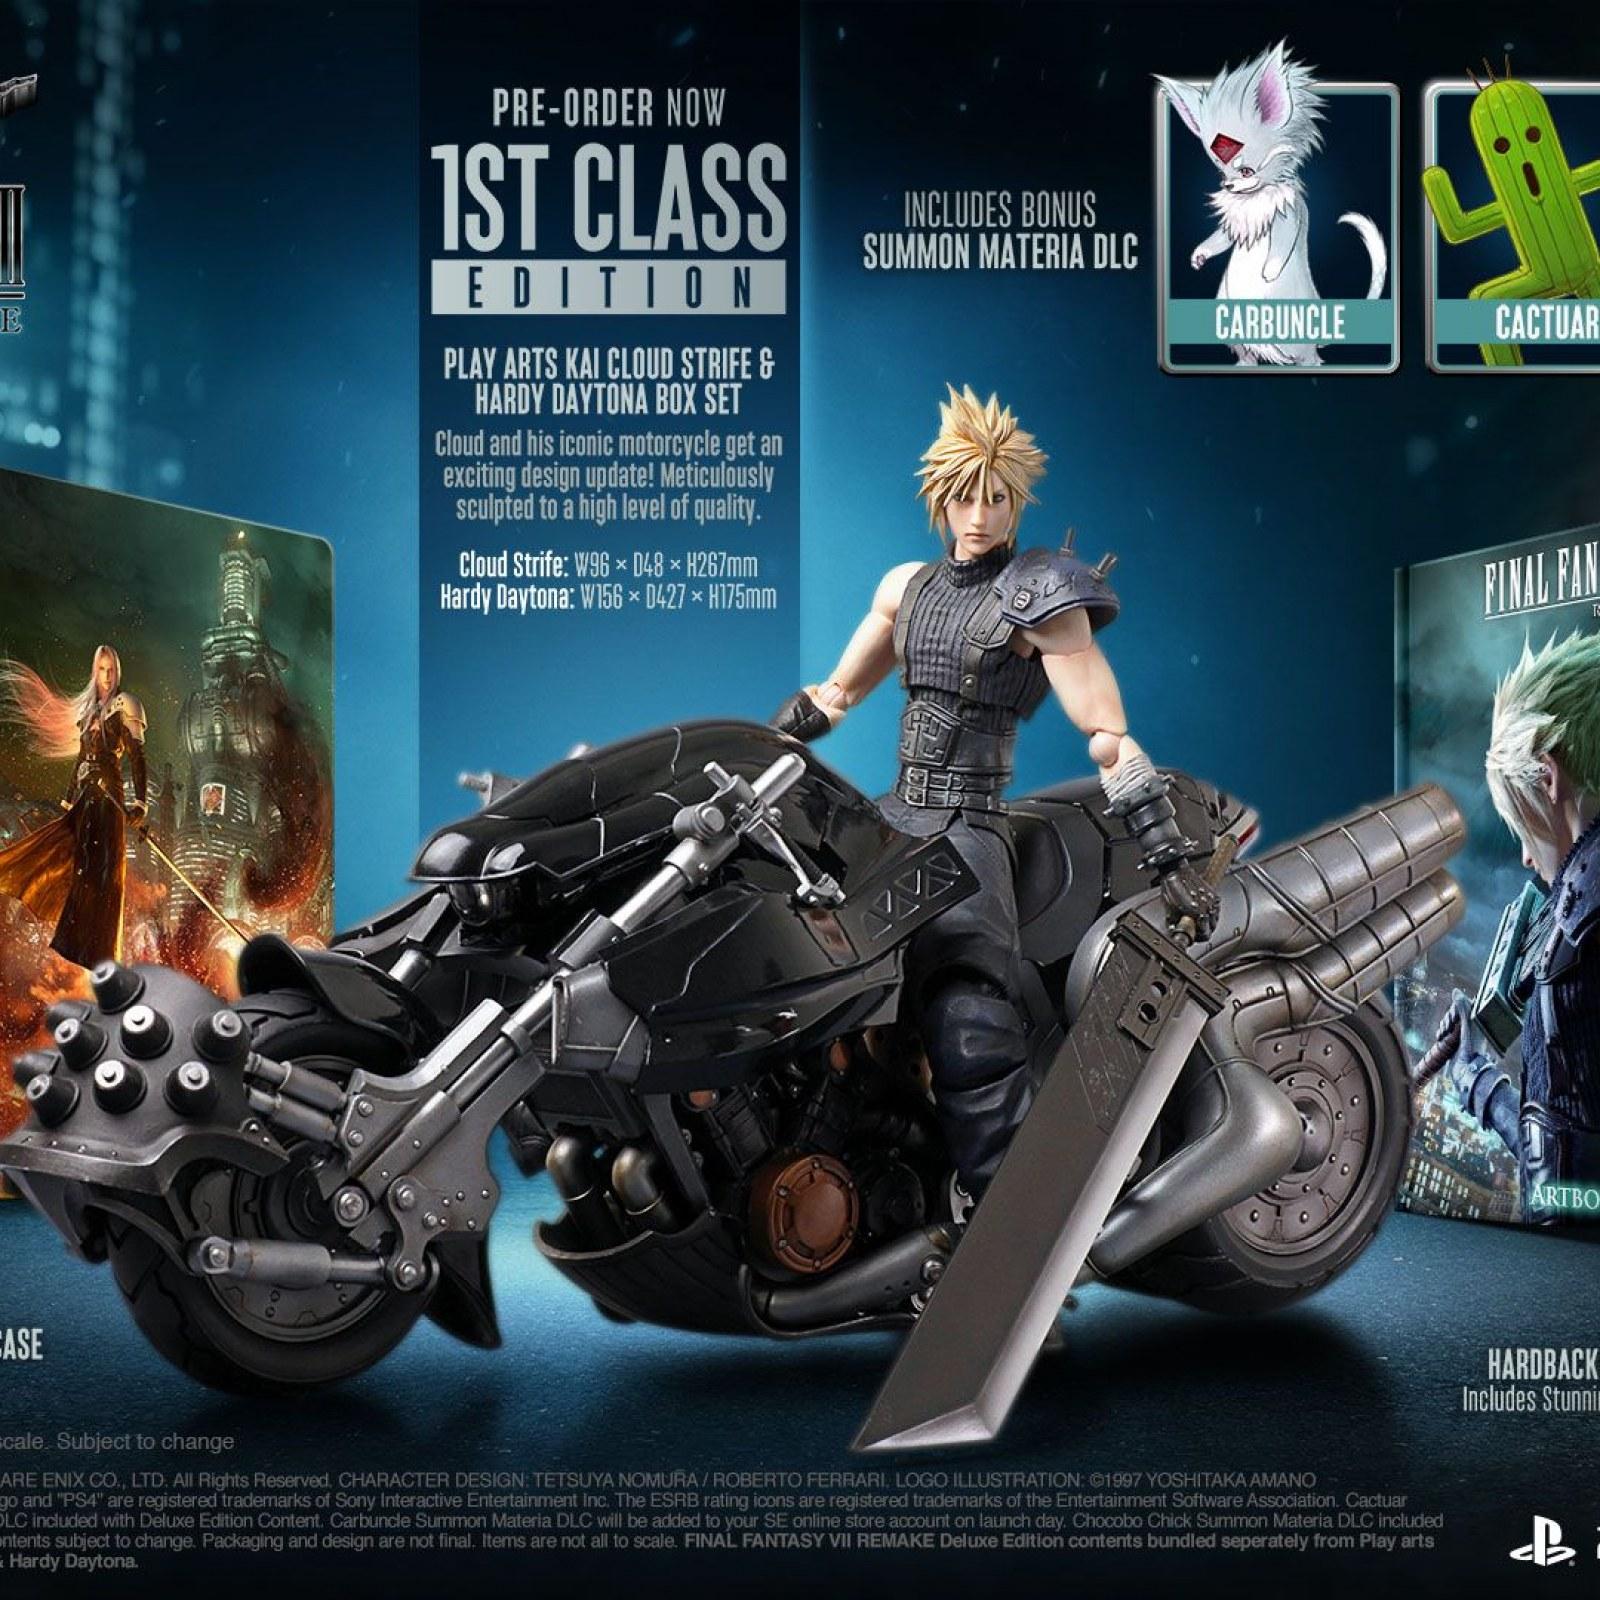 Final Fantasy VII' Remake E3 2019: First Look at Tifa, New